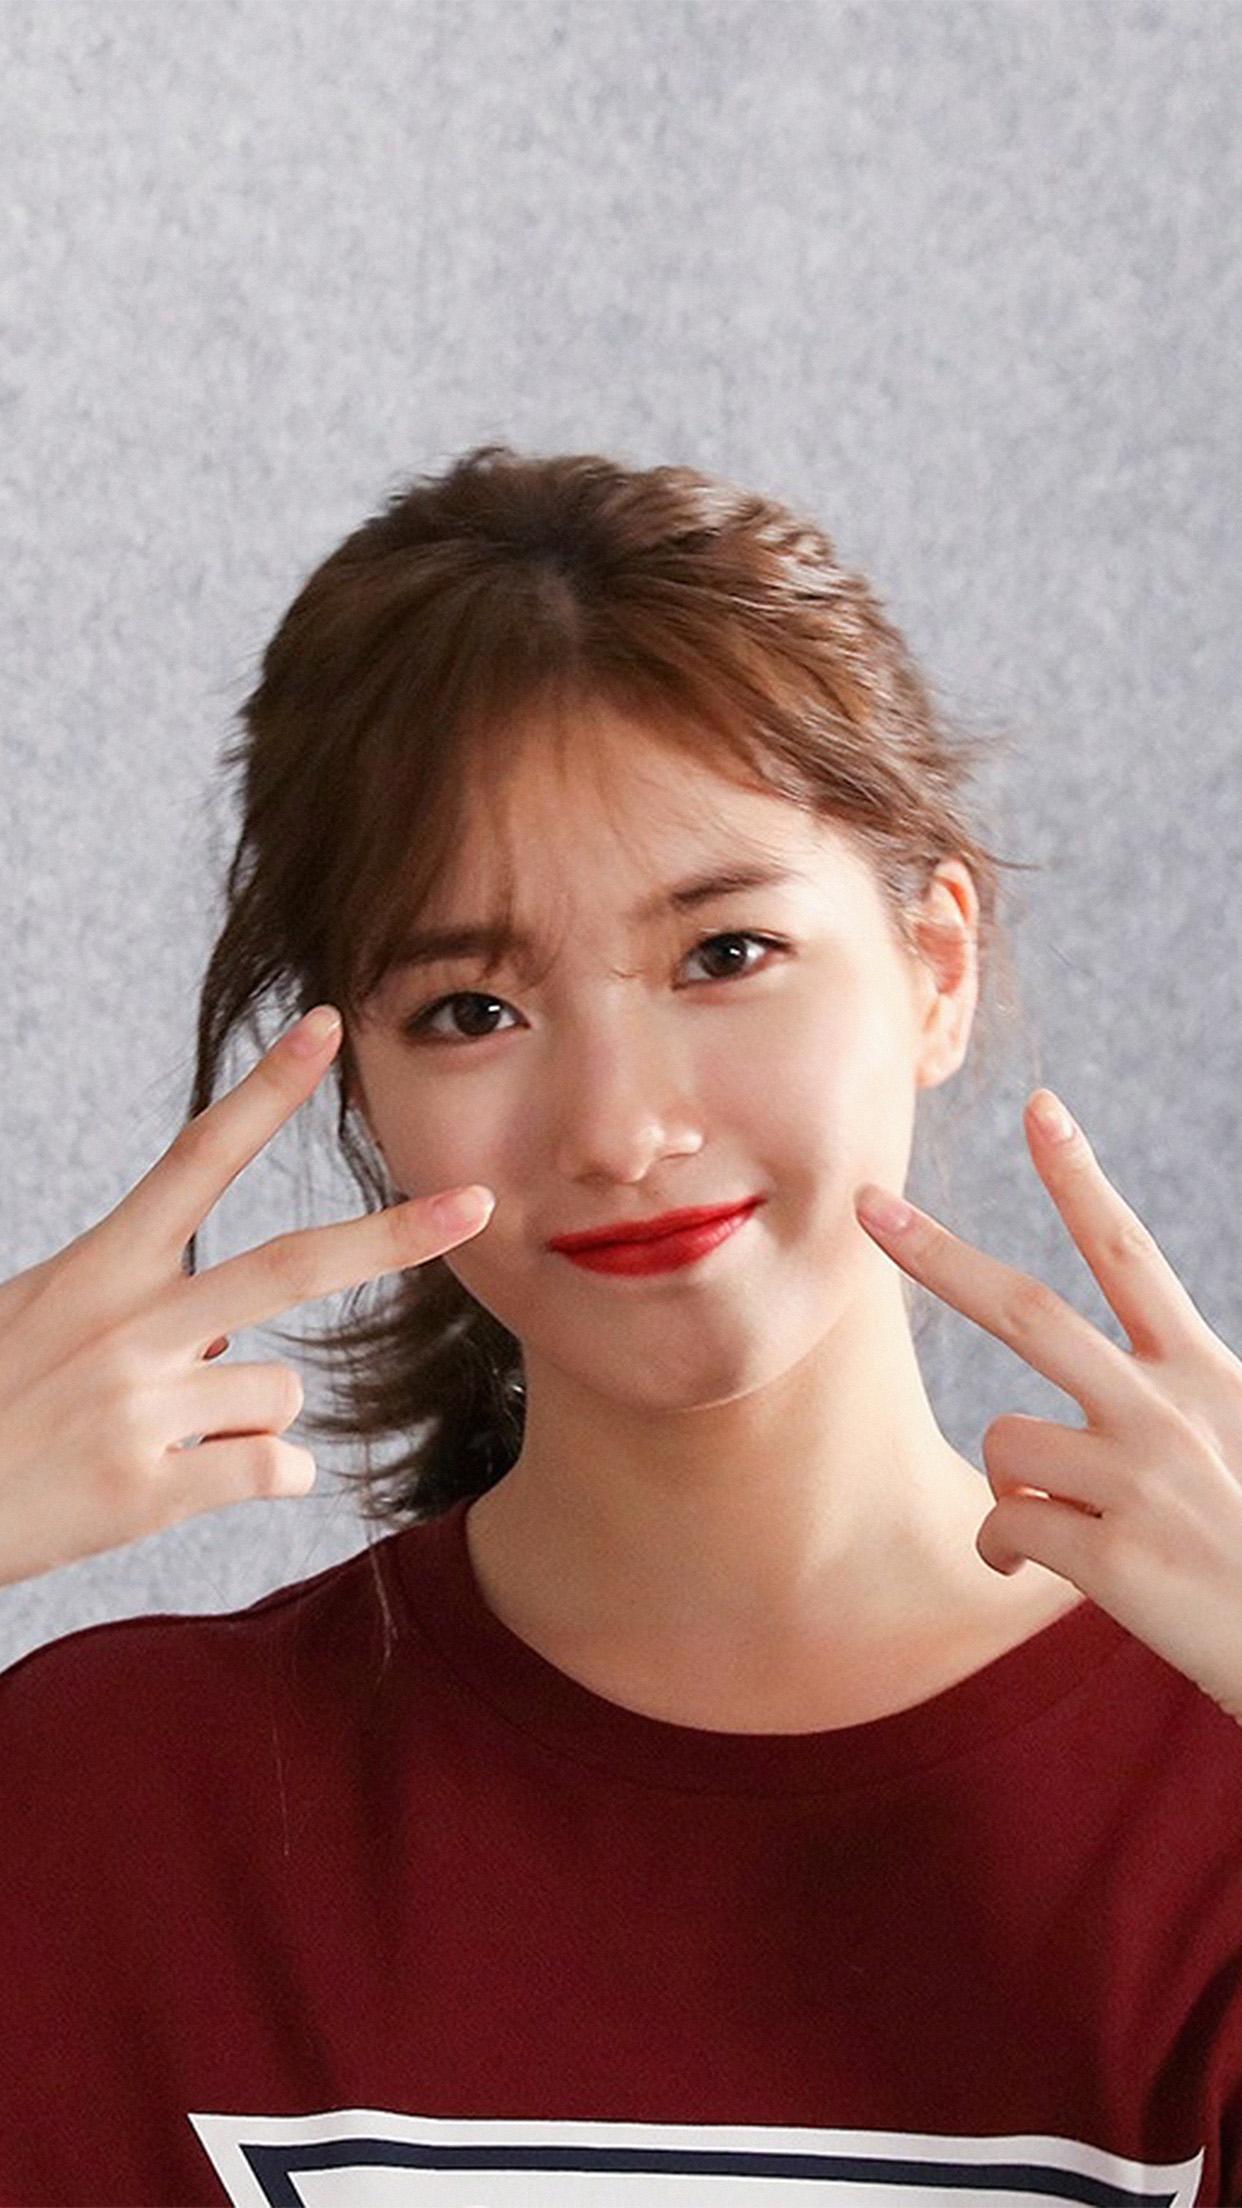 Korean Girls Fashion Wallpaper Hd I Hd Images To Lovely Hair rh